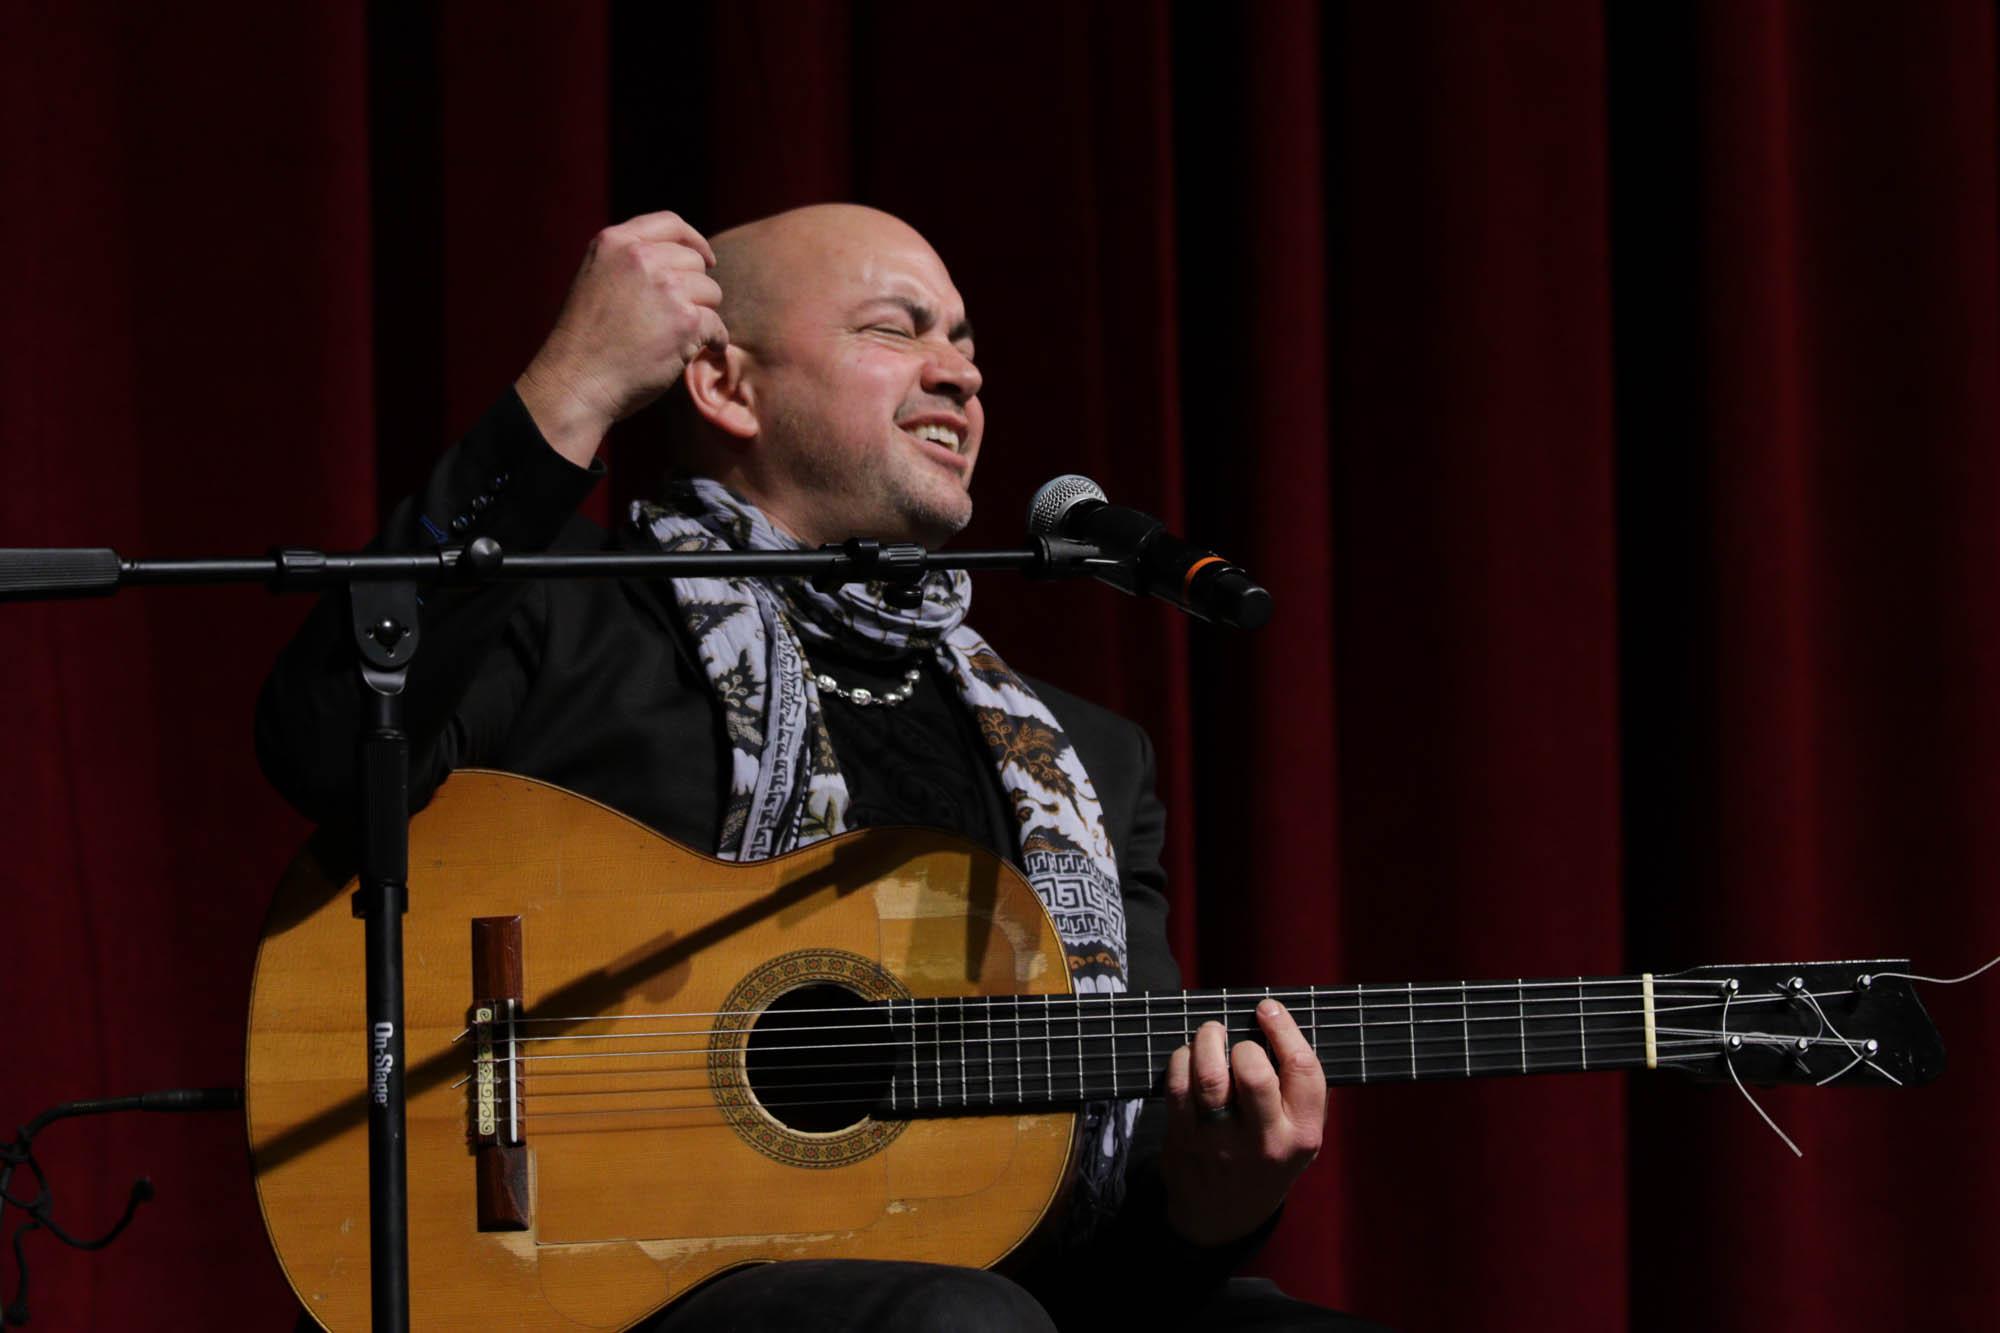 Seeking to unify through song